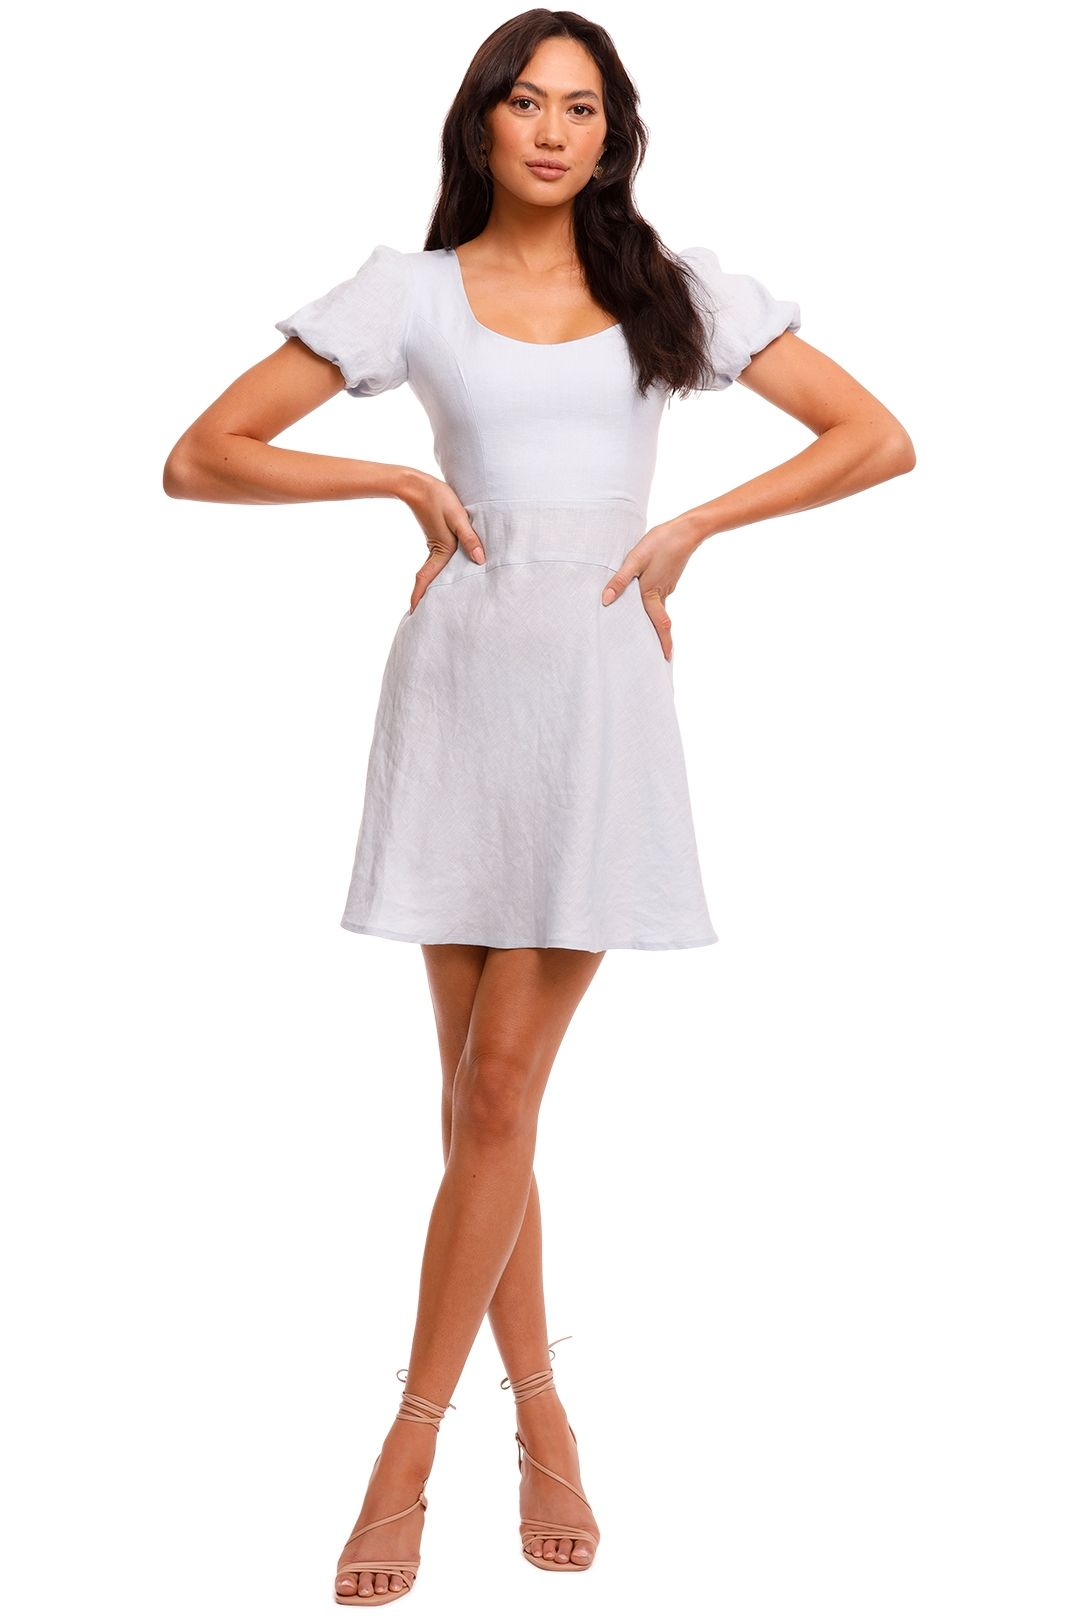 Jillian Boustred Natasha Mini Dress Powder Blue scoop